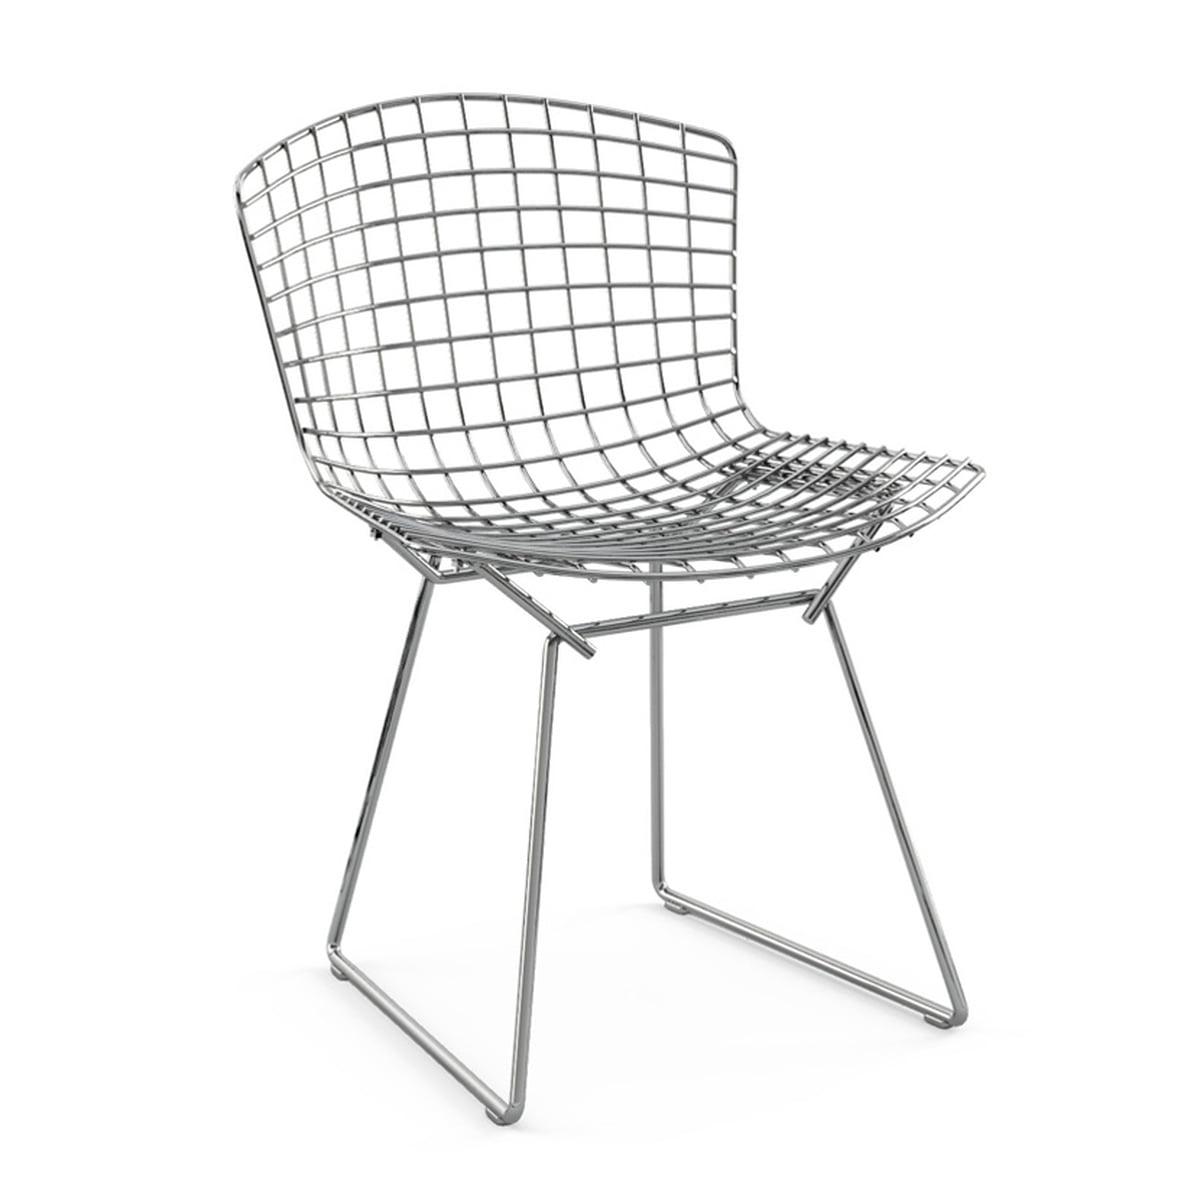 Bertoia stuhl von knoll connox - Bertoia stuhl ...